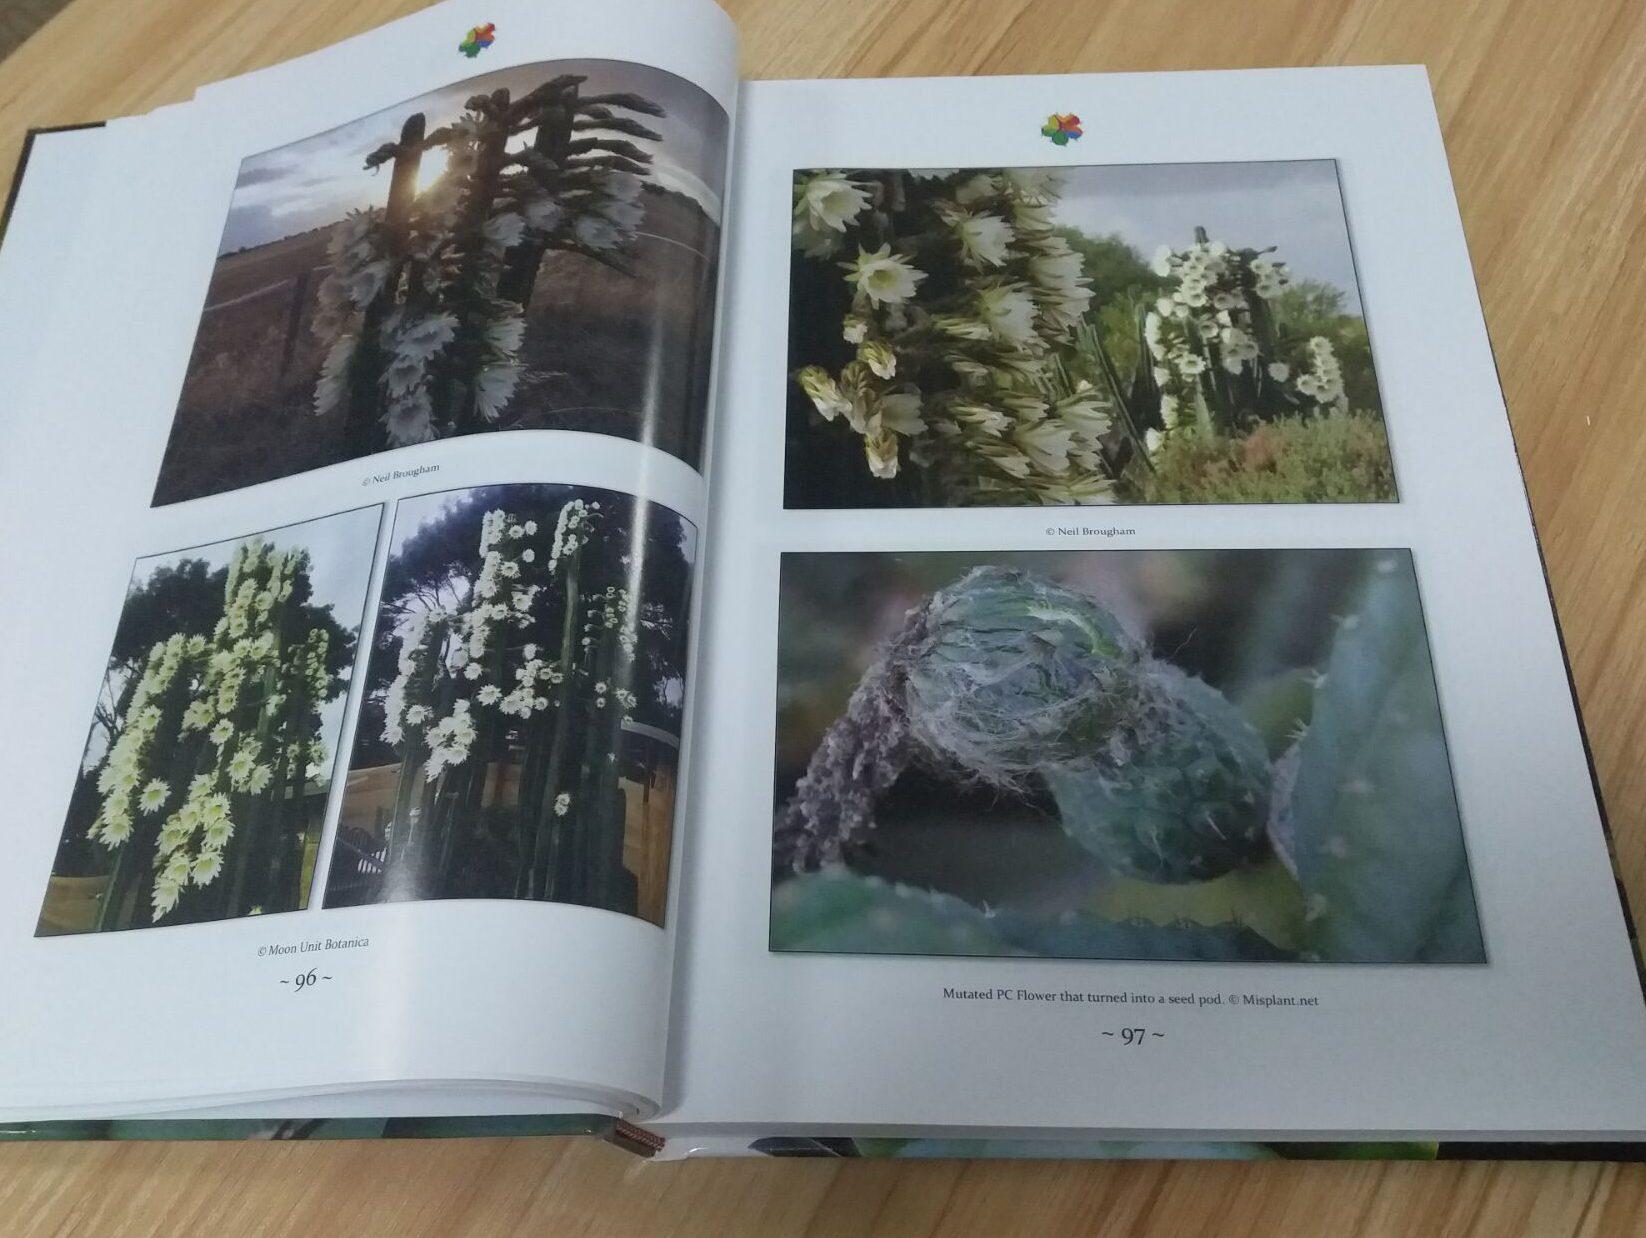 TRICHOCEREUS Book Vol. 1 Patrick Noll Buch Cactus Echinopsis 8